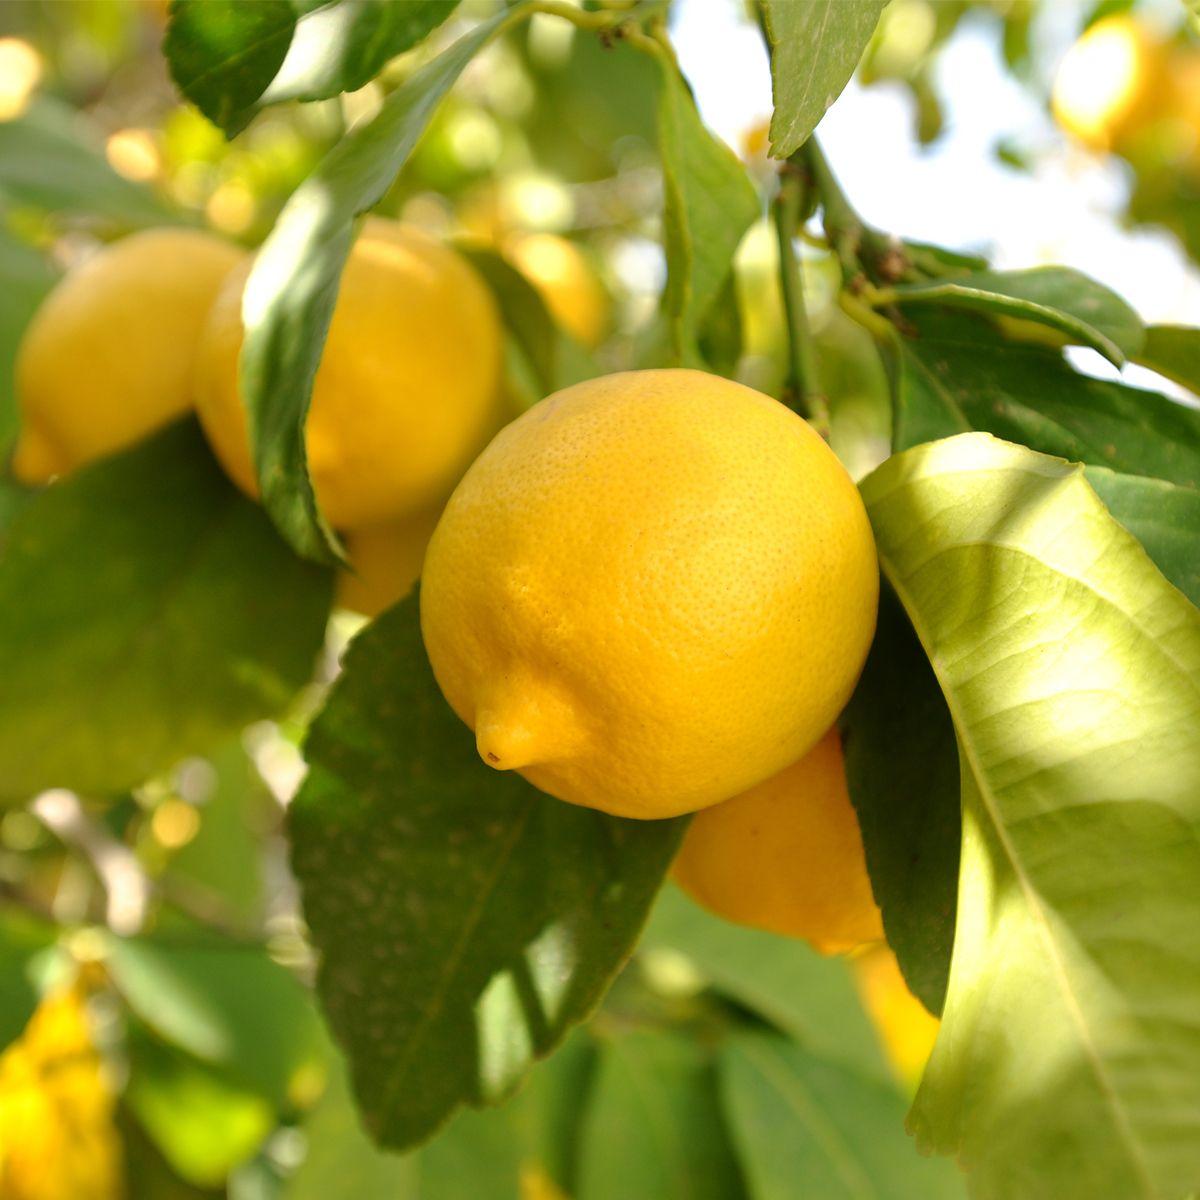 Eureka Lemon Tree For Sale Online Citrus Com Eureka Lemon Tree Meyer Lemon Tree Eureka Lemon